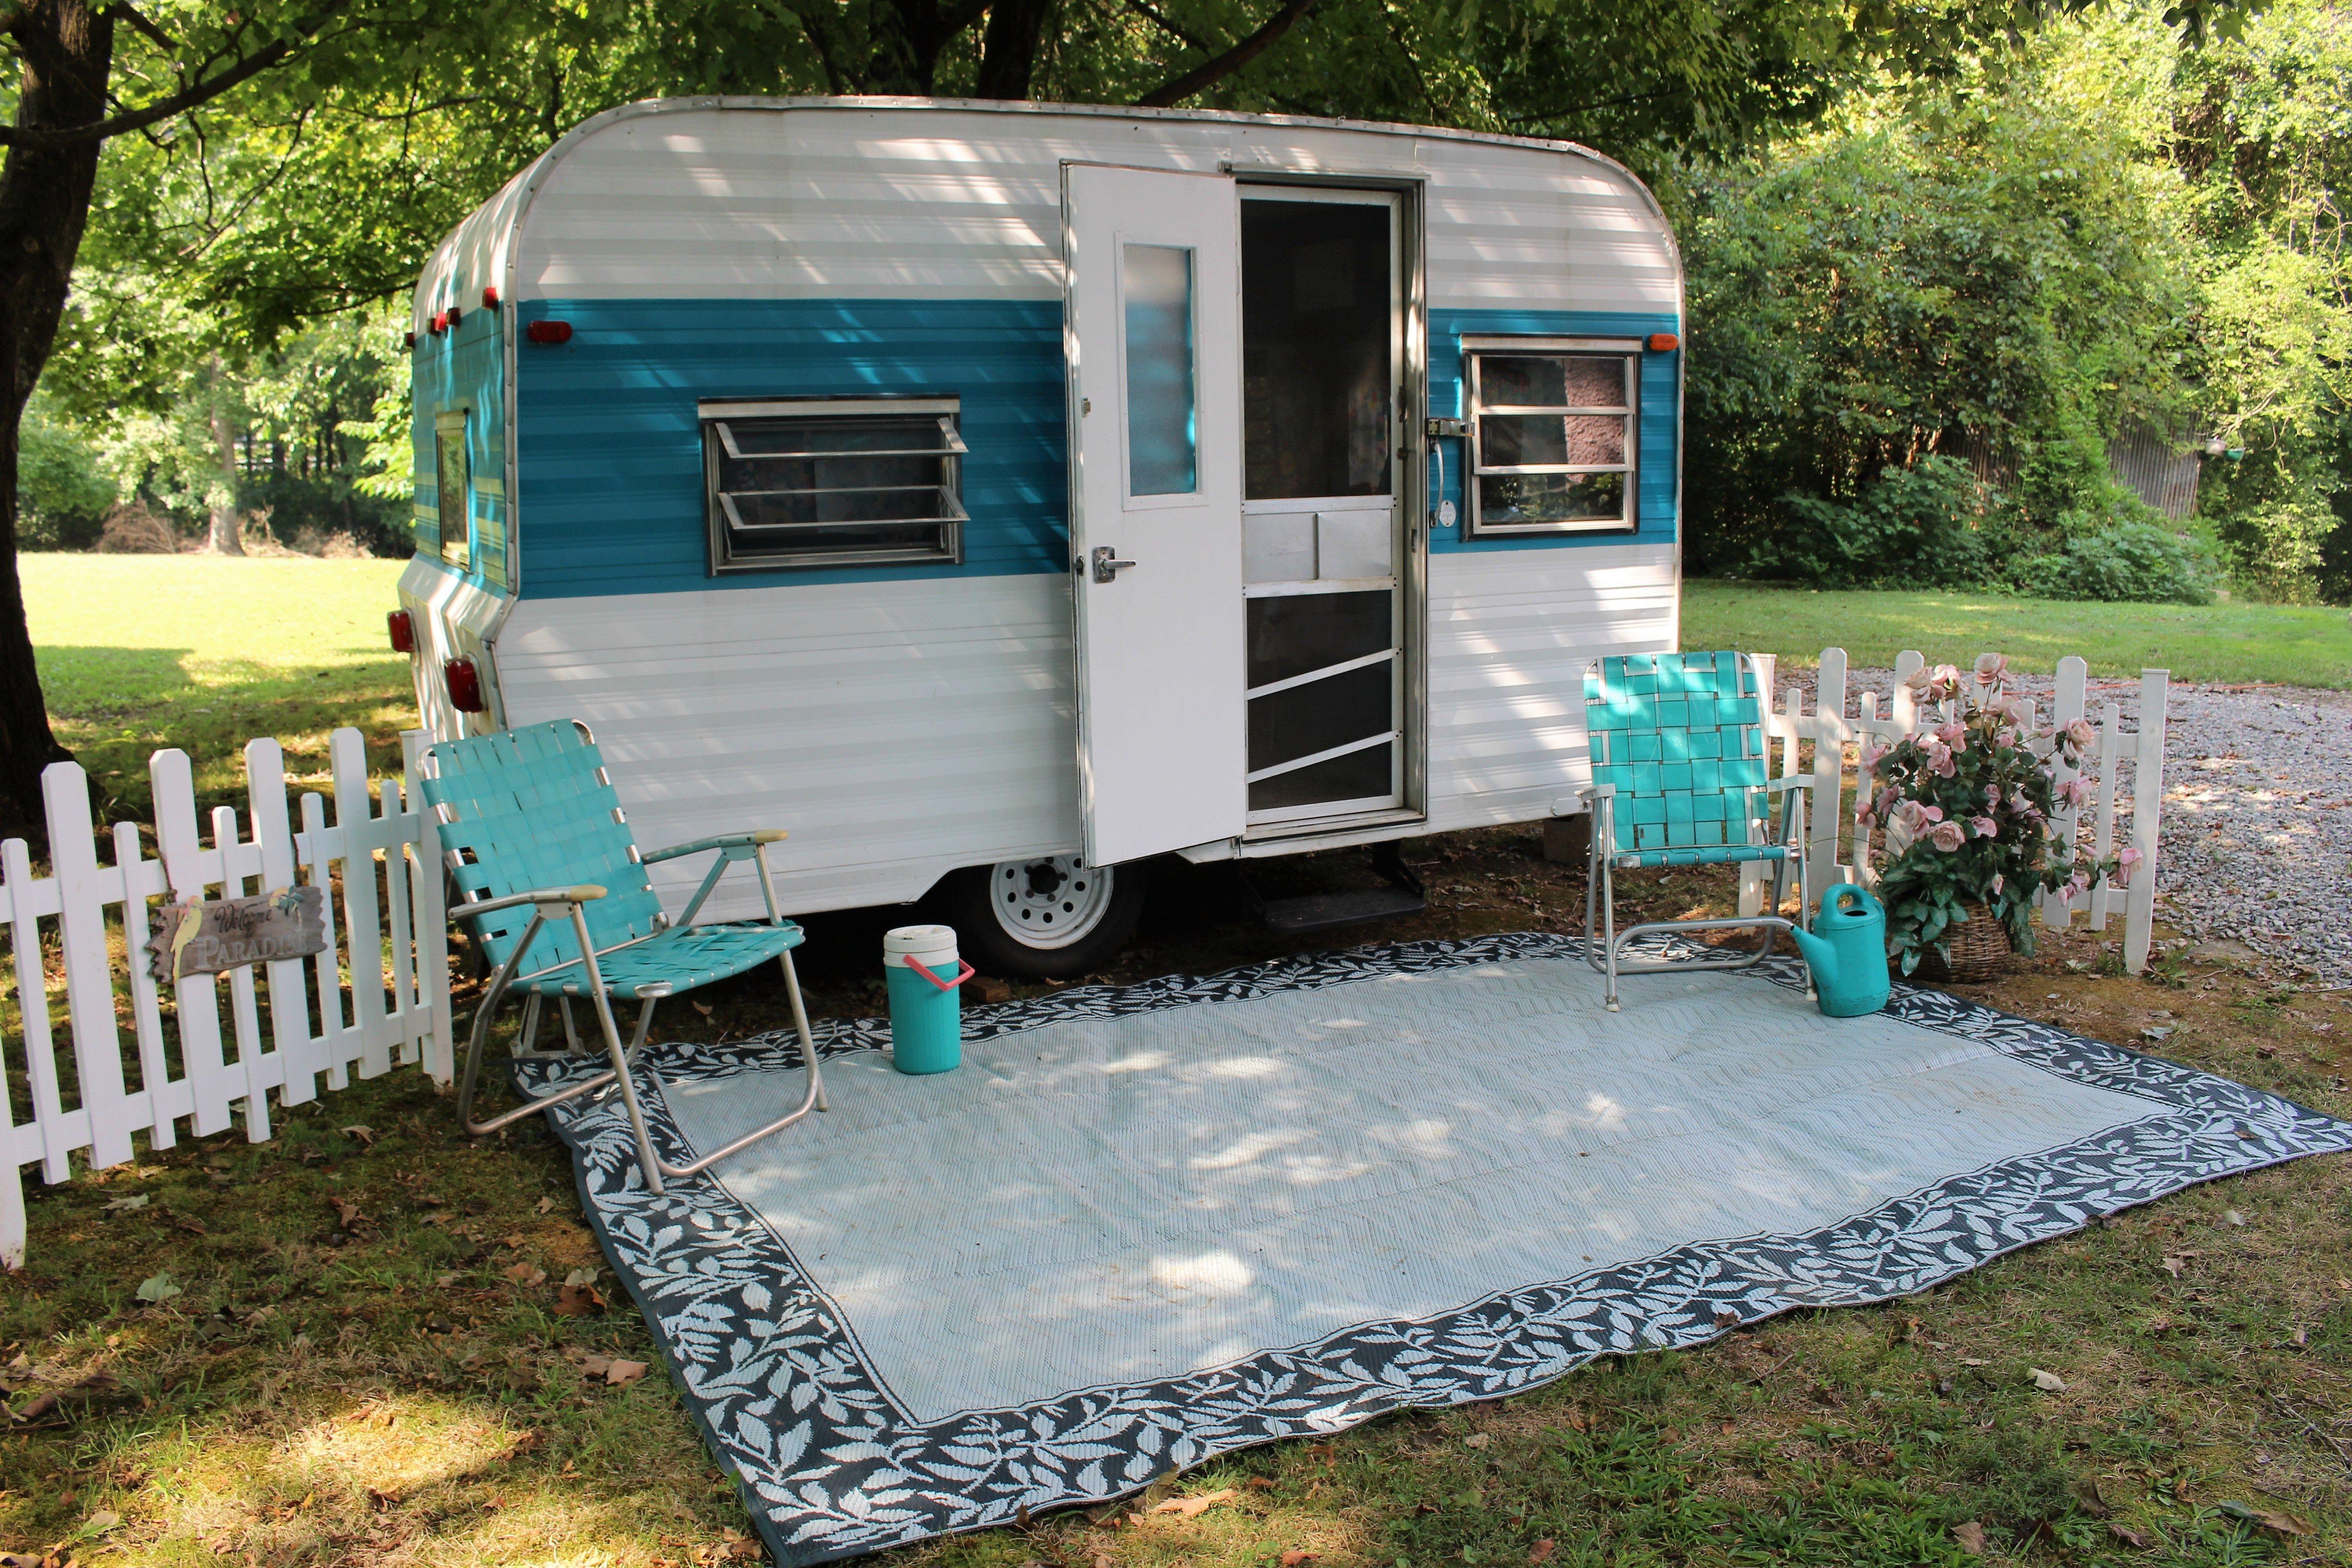 Img 5540 2 Jpg 5 105 3 403 Pixels Vintage Camper Vintage Travel Trailers Vintage Camping